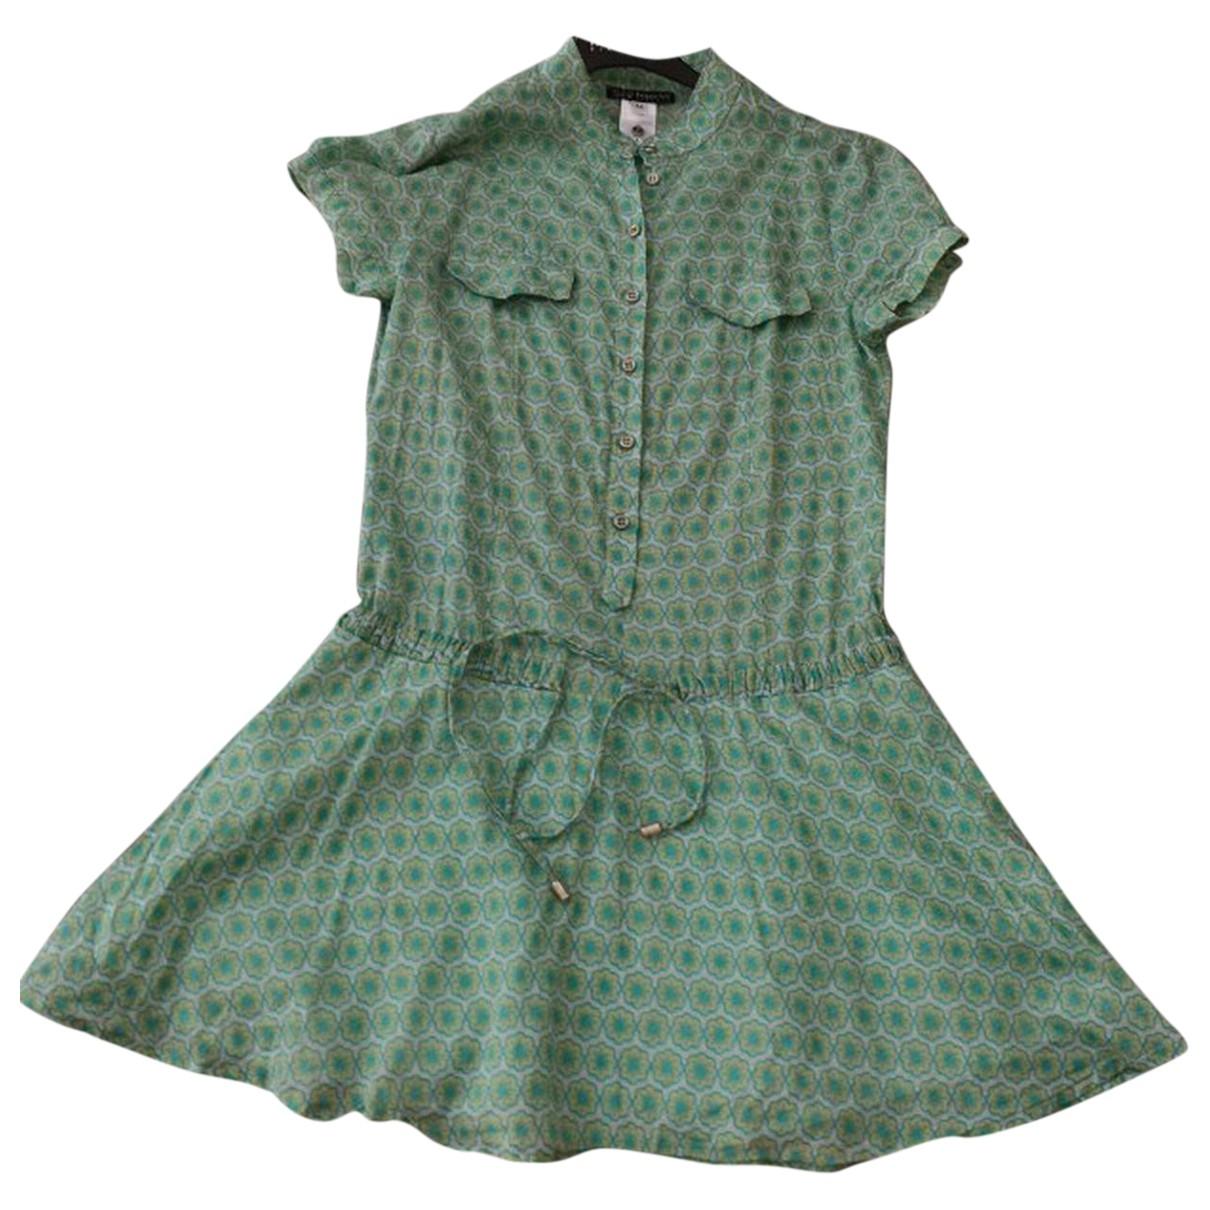 Patrizia Pepe \N Kleid in  Gruen Baumwolle